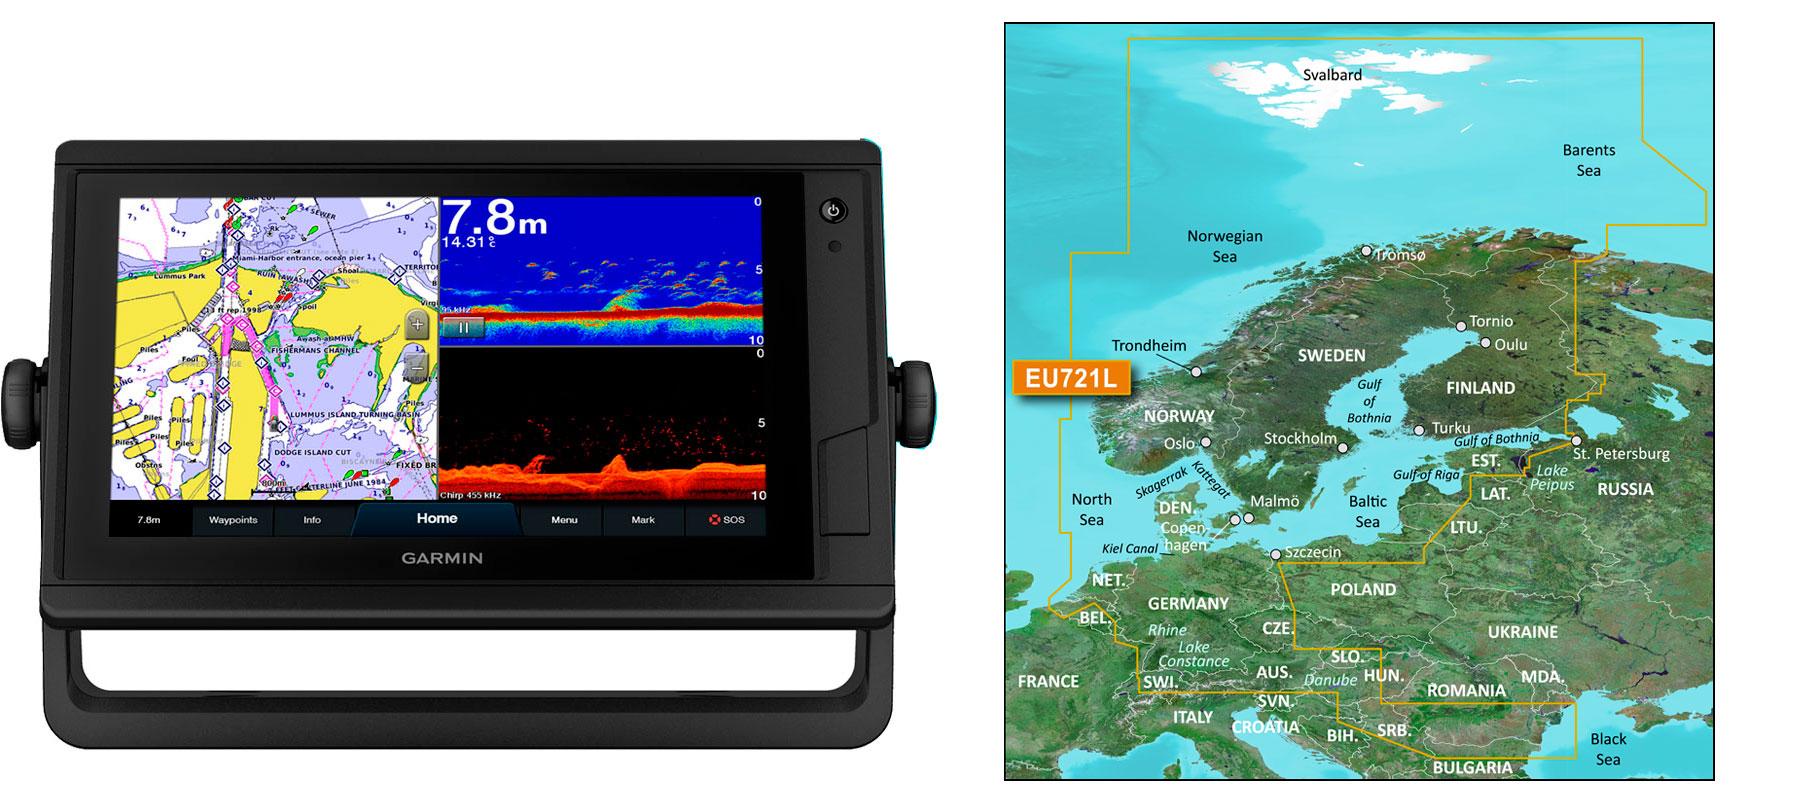 Garmin GPSmap 922xs PLUS med G3 Vision VEU721L